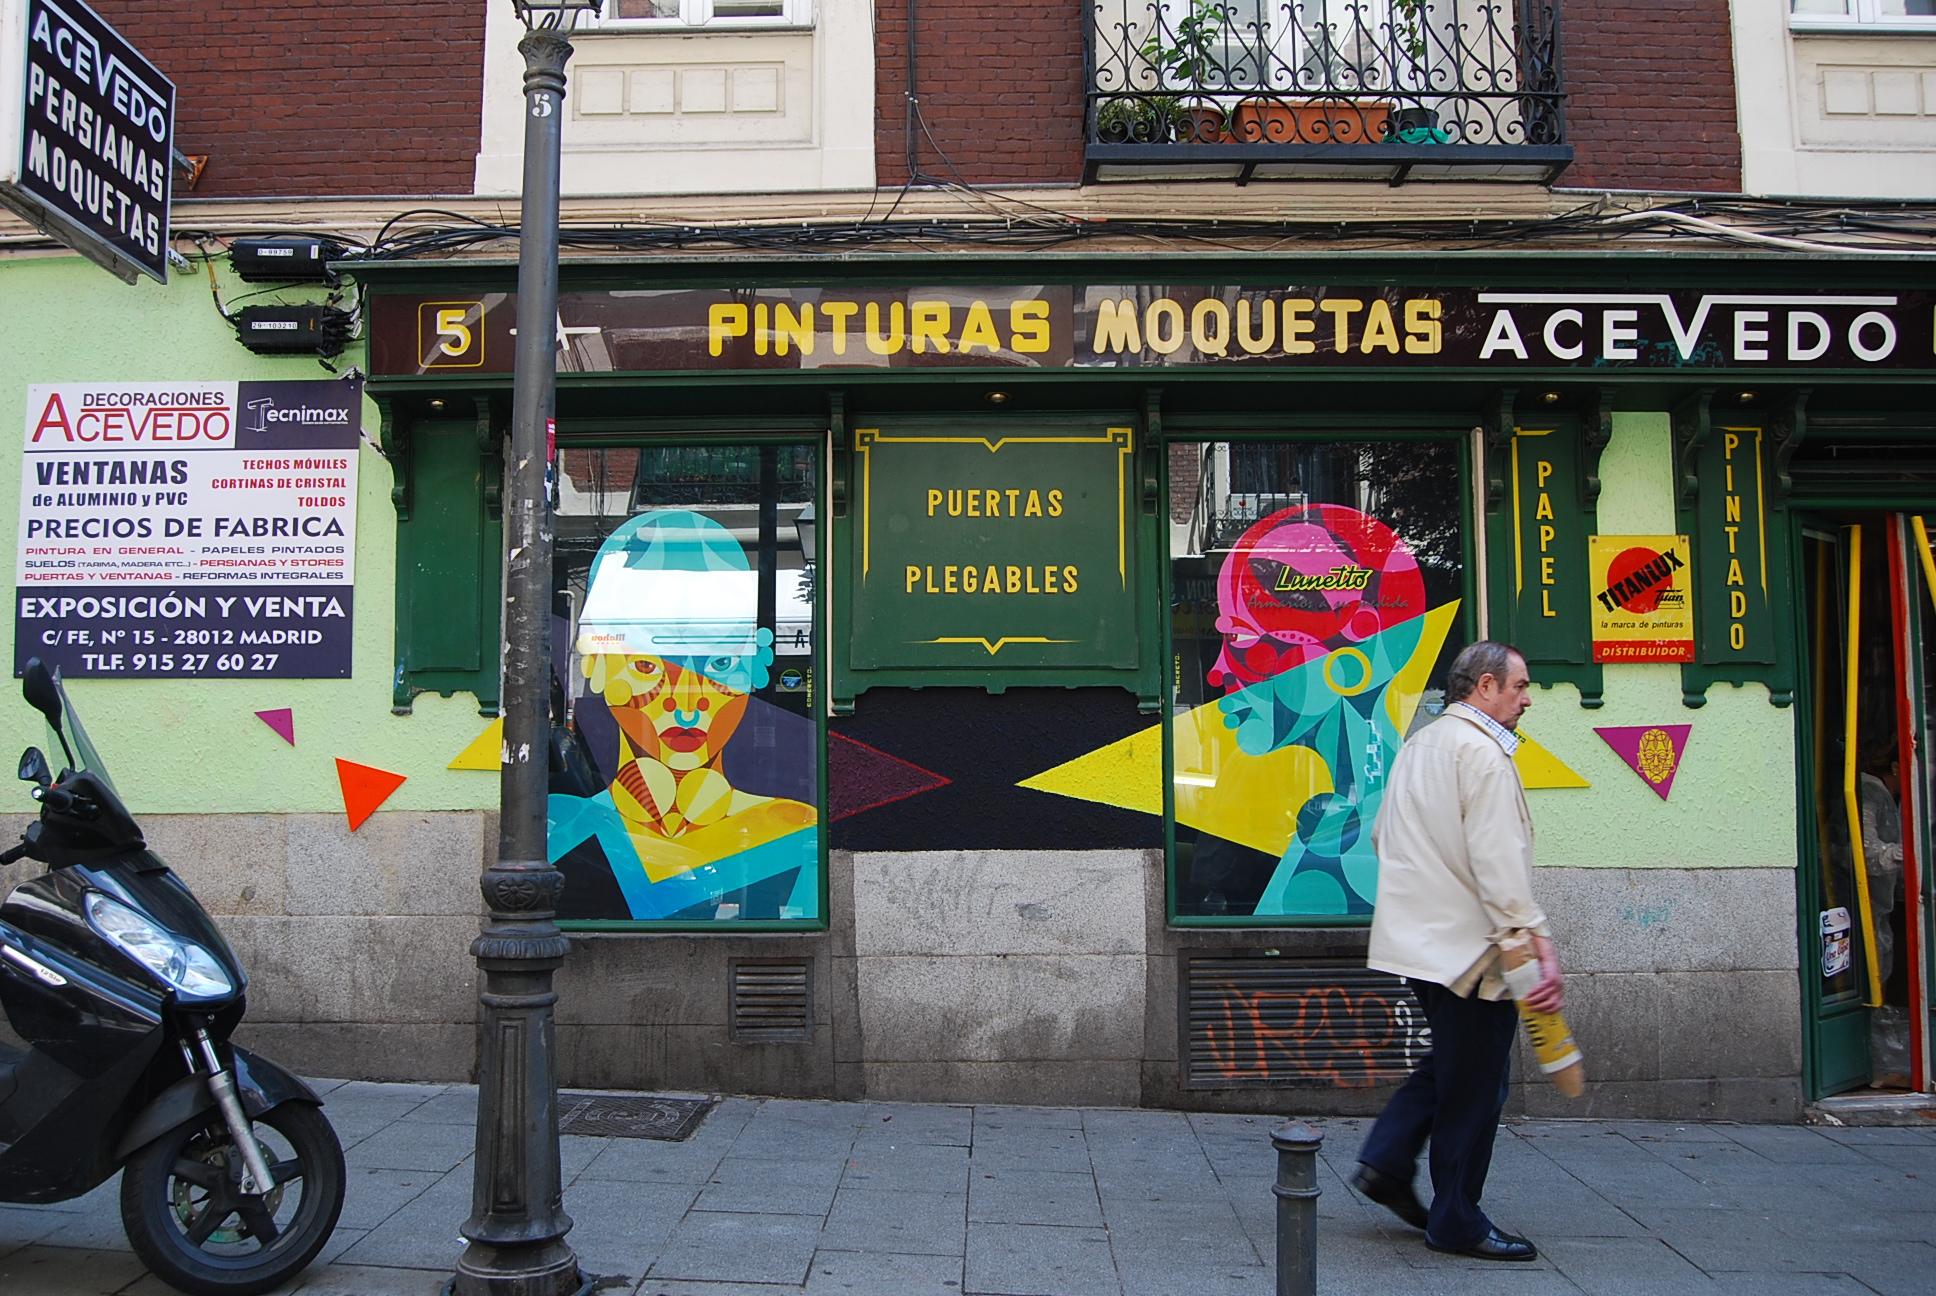 Decoraciones Acevedo Miguel Servet - Concreto Street Art